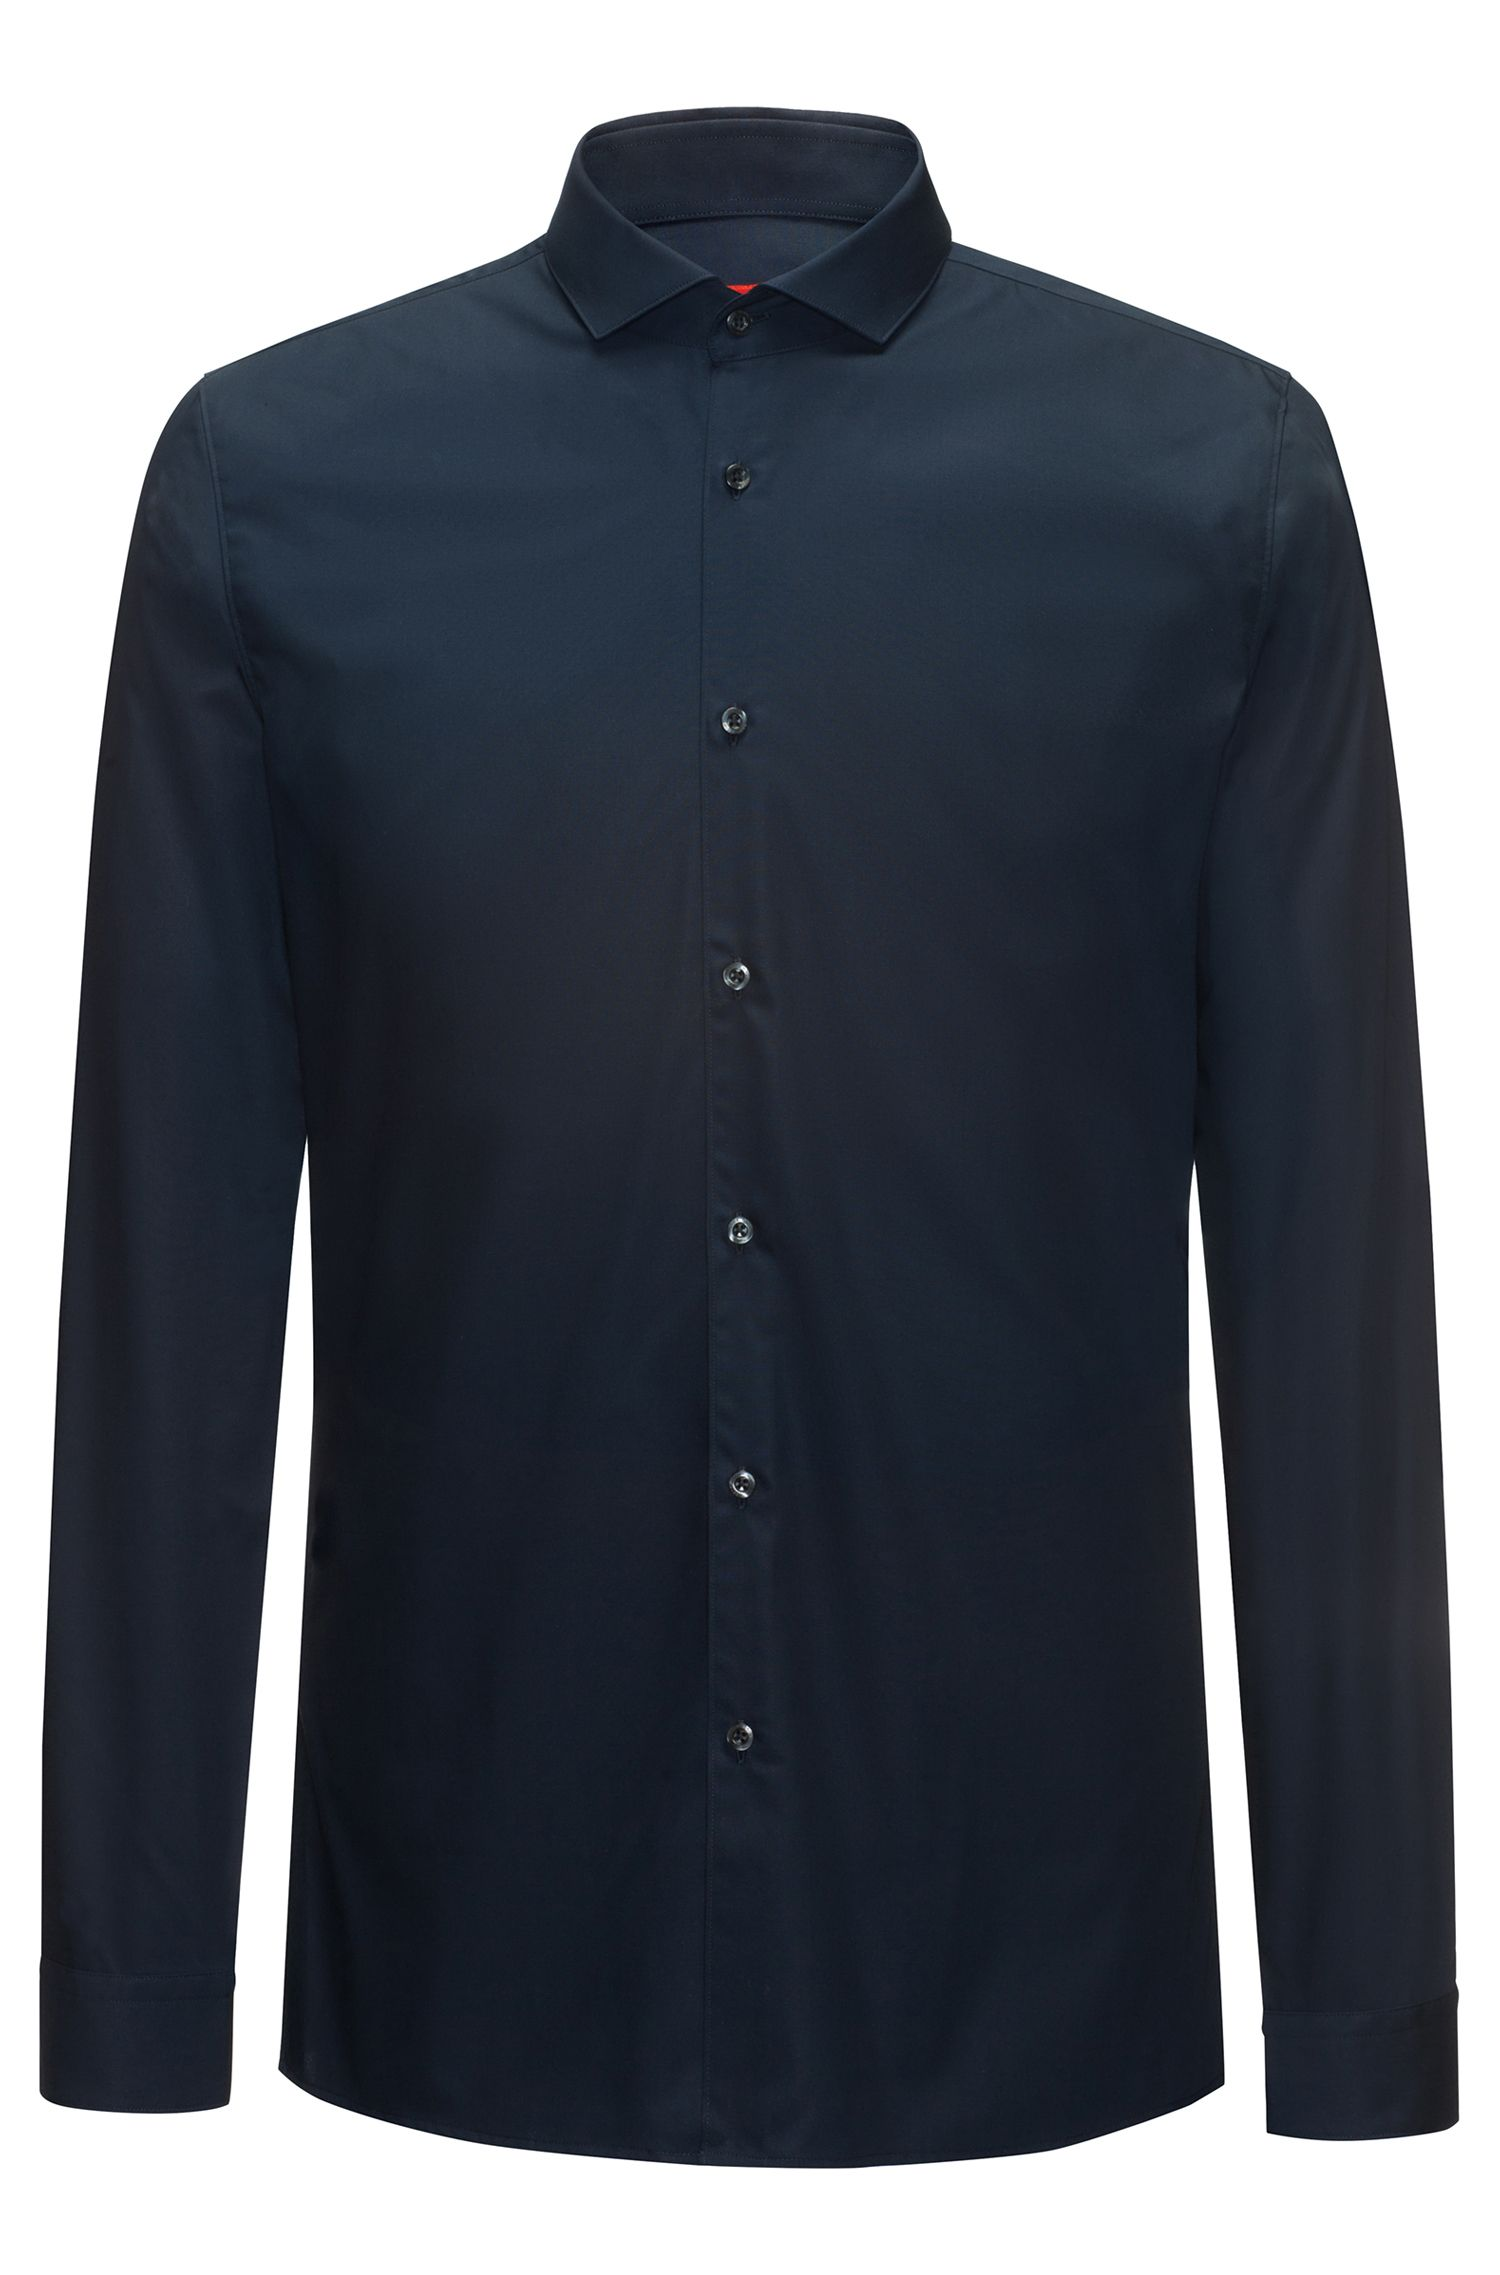 Camicia extra slim fit in popeline di cotone, Blu scuro